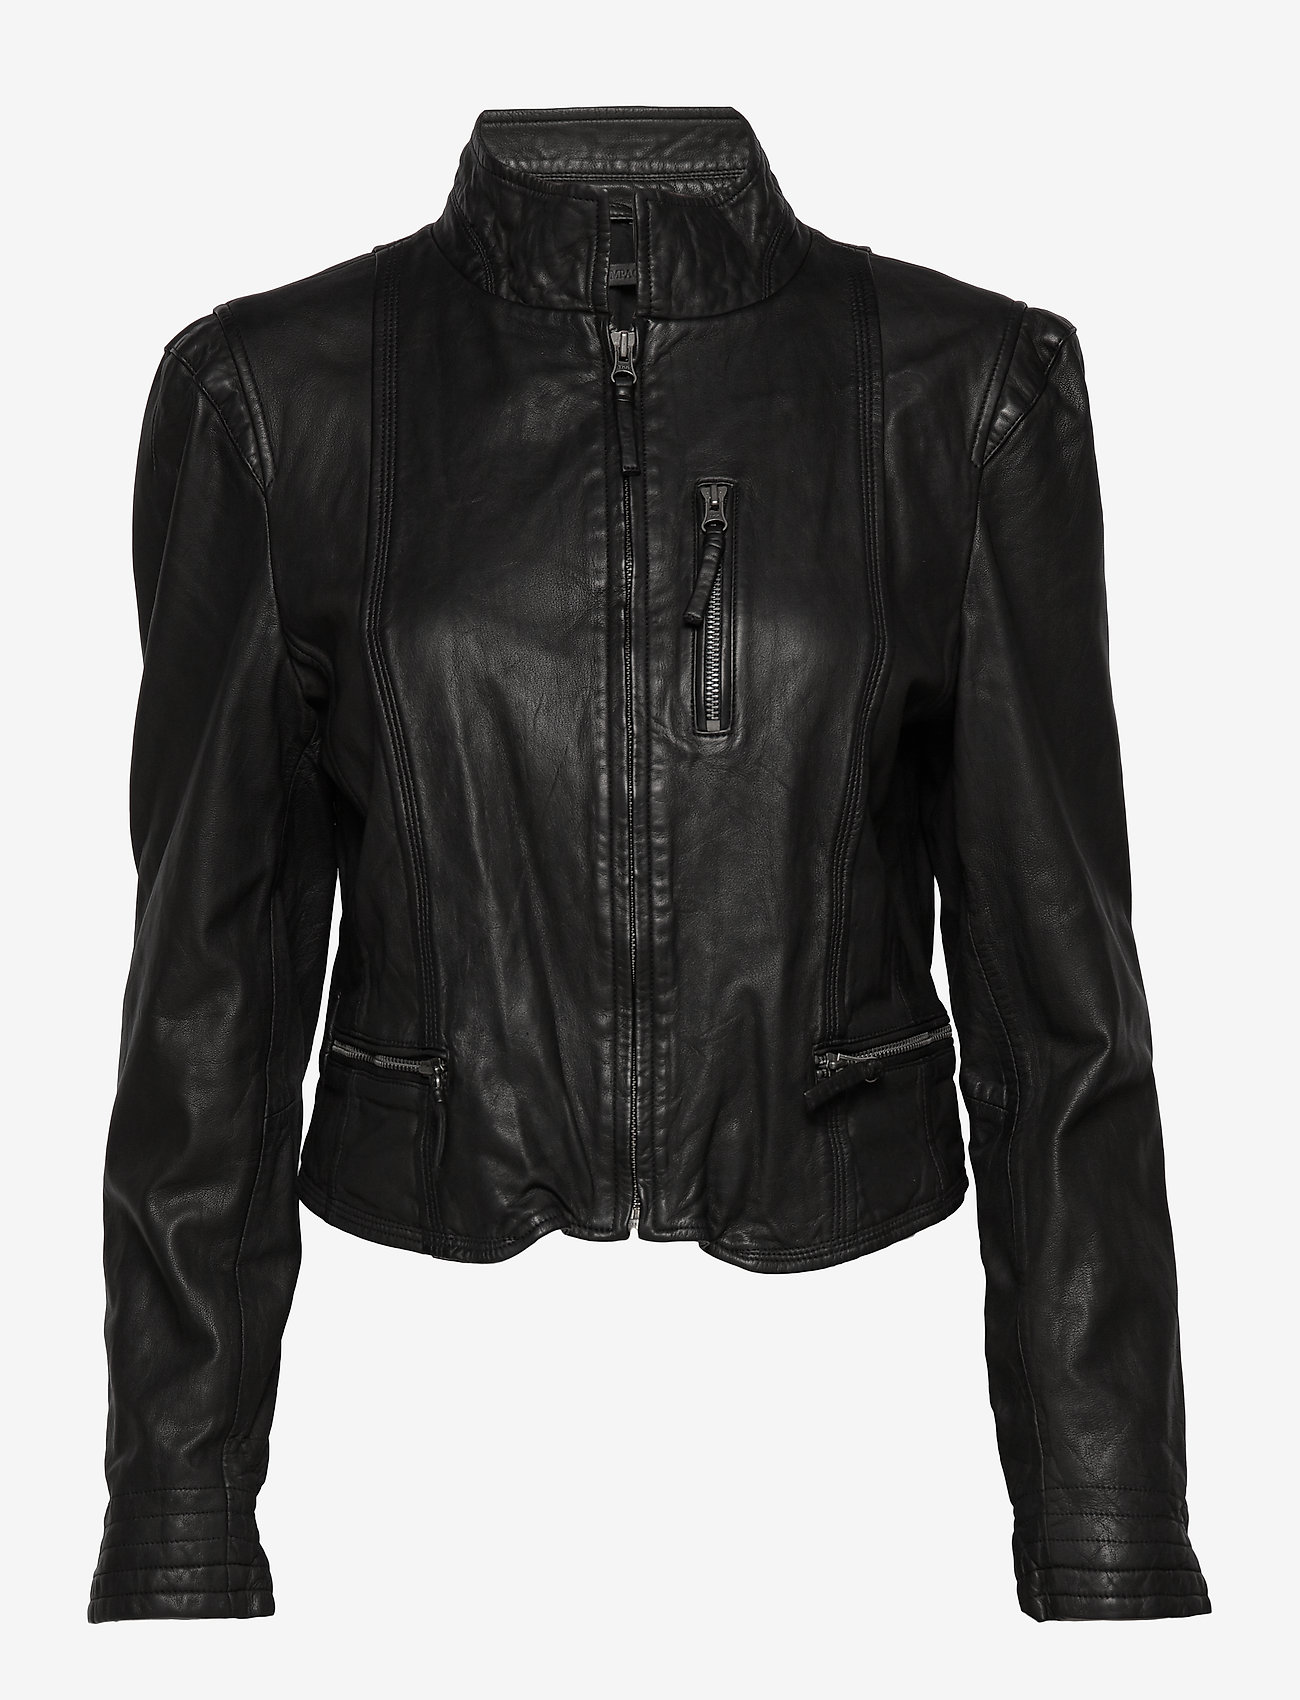 MDK / Munderingskompagniet - Rucy leather jacket (black) - nahkatakit - black - 1